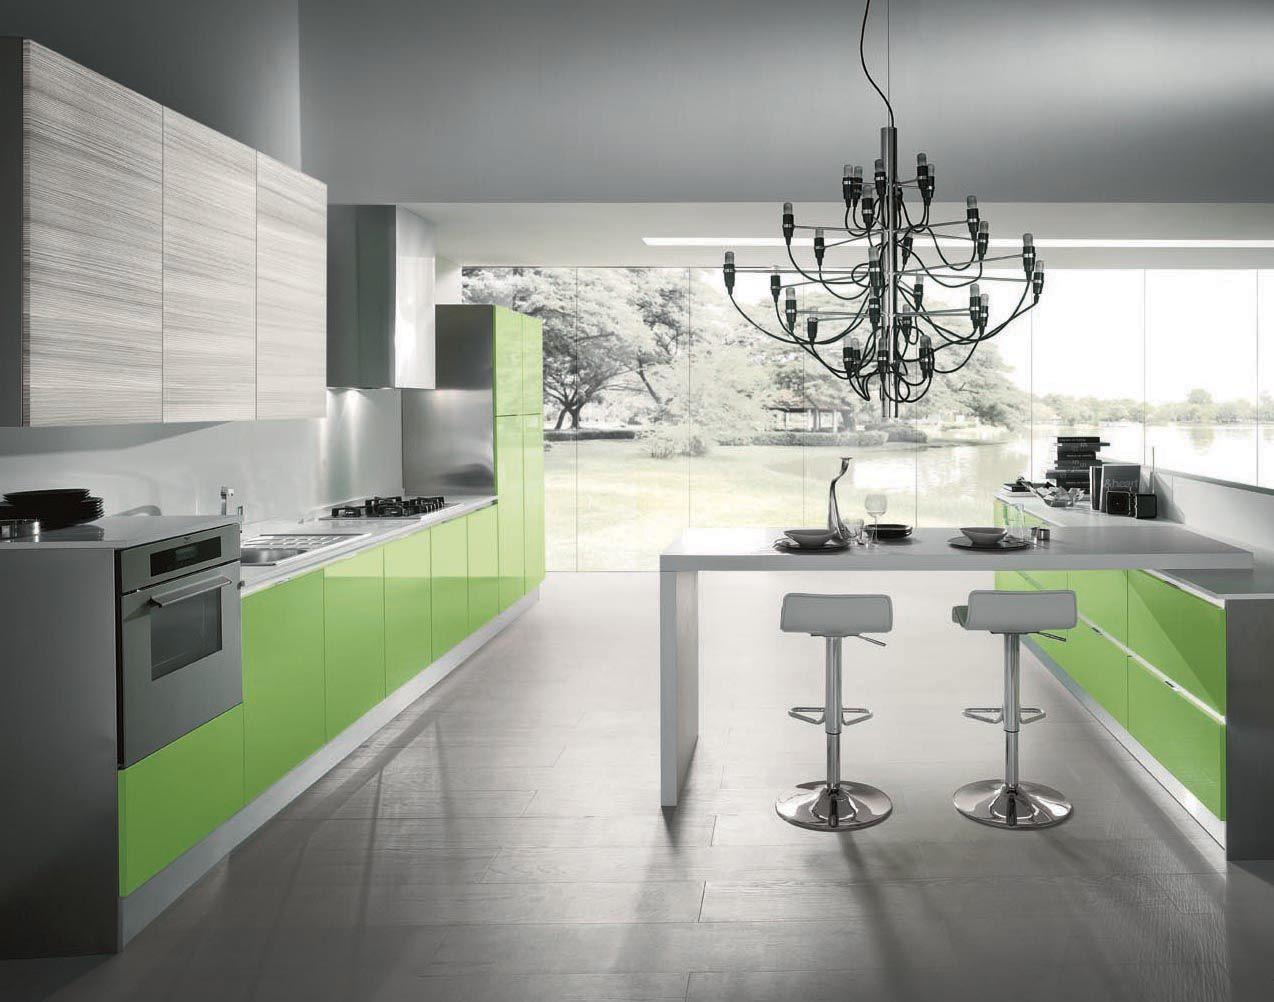 Cucina FLASH > #arredamento #verde #acido #design | Personalizzare ...